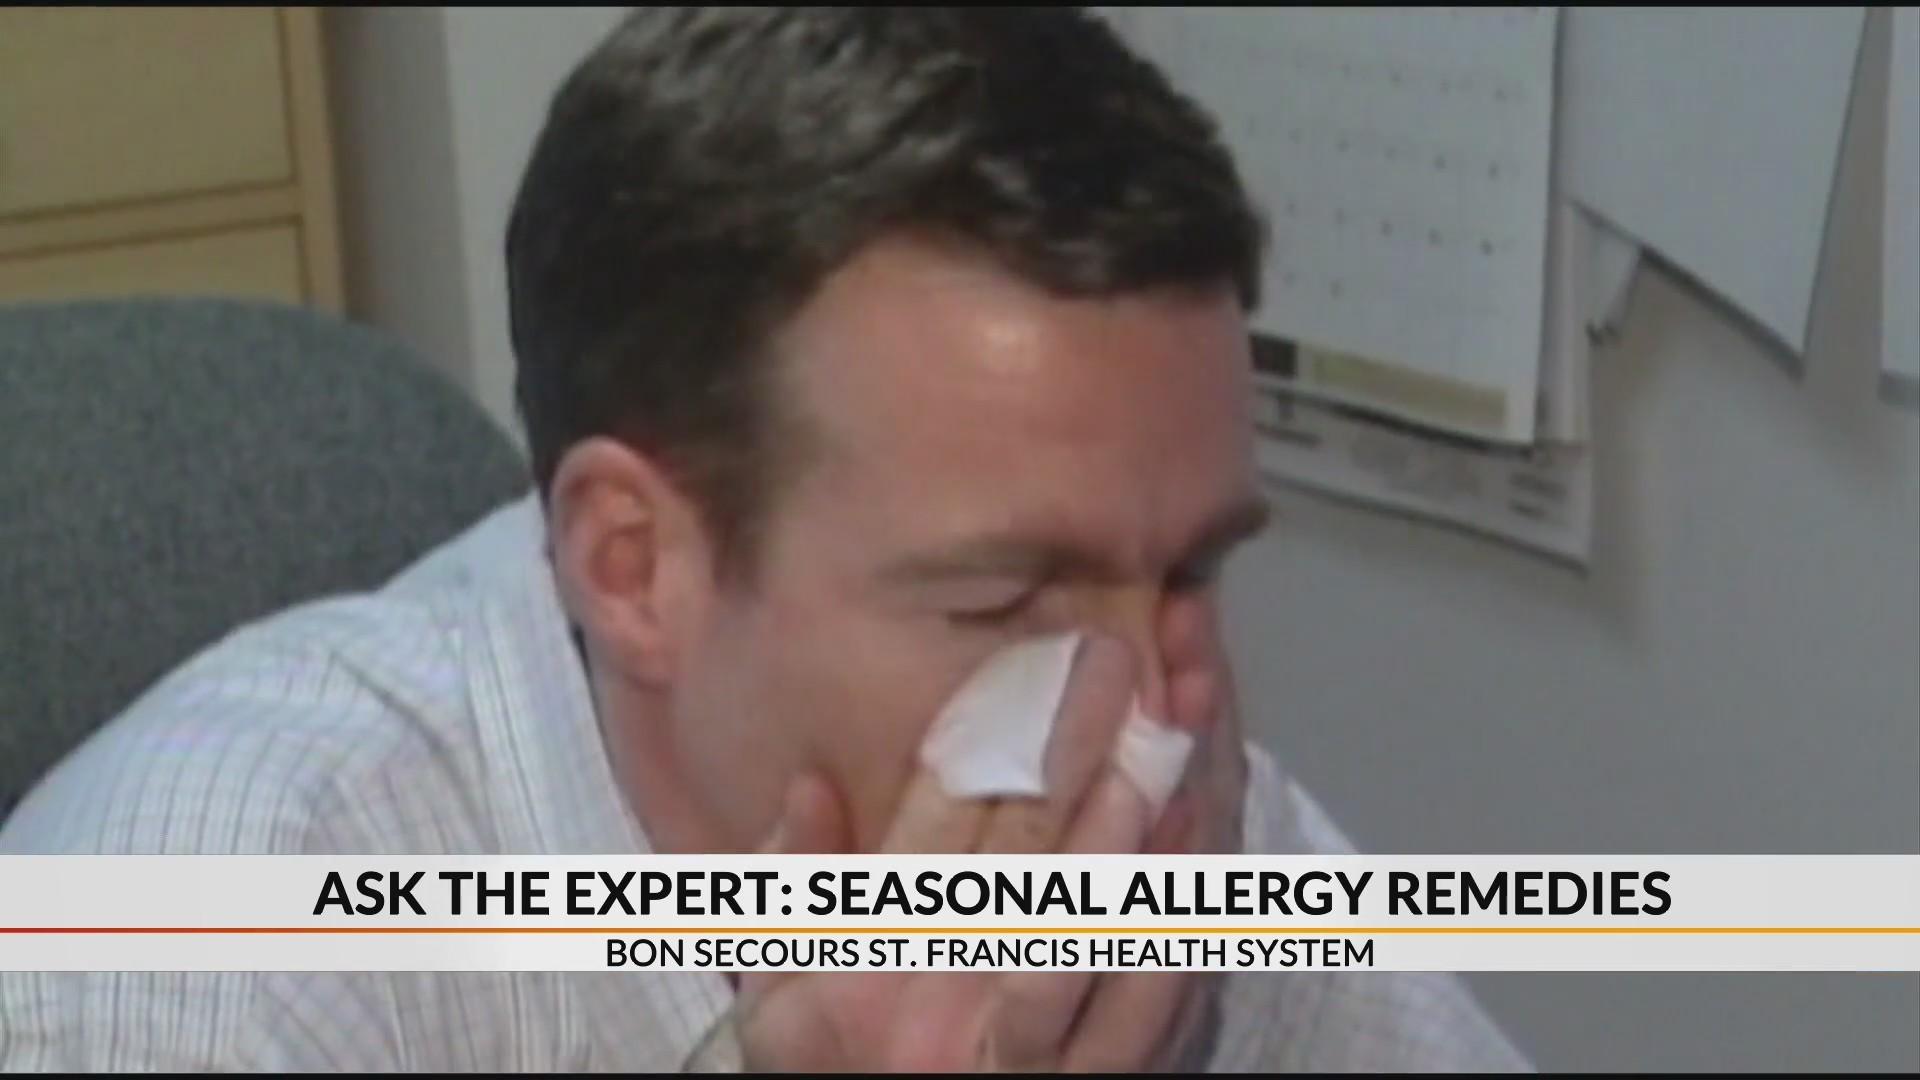 Foods and practices to help curb seasonal allergies